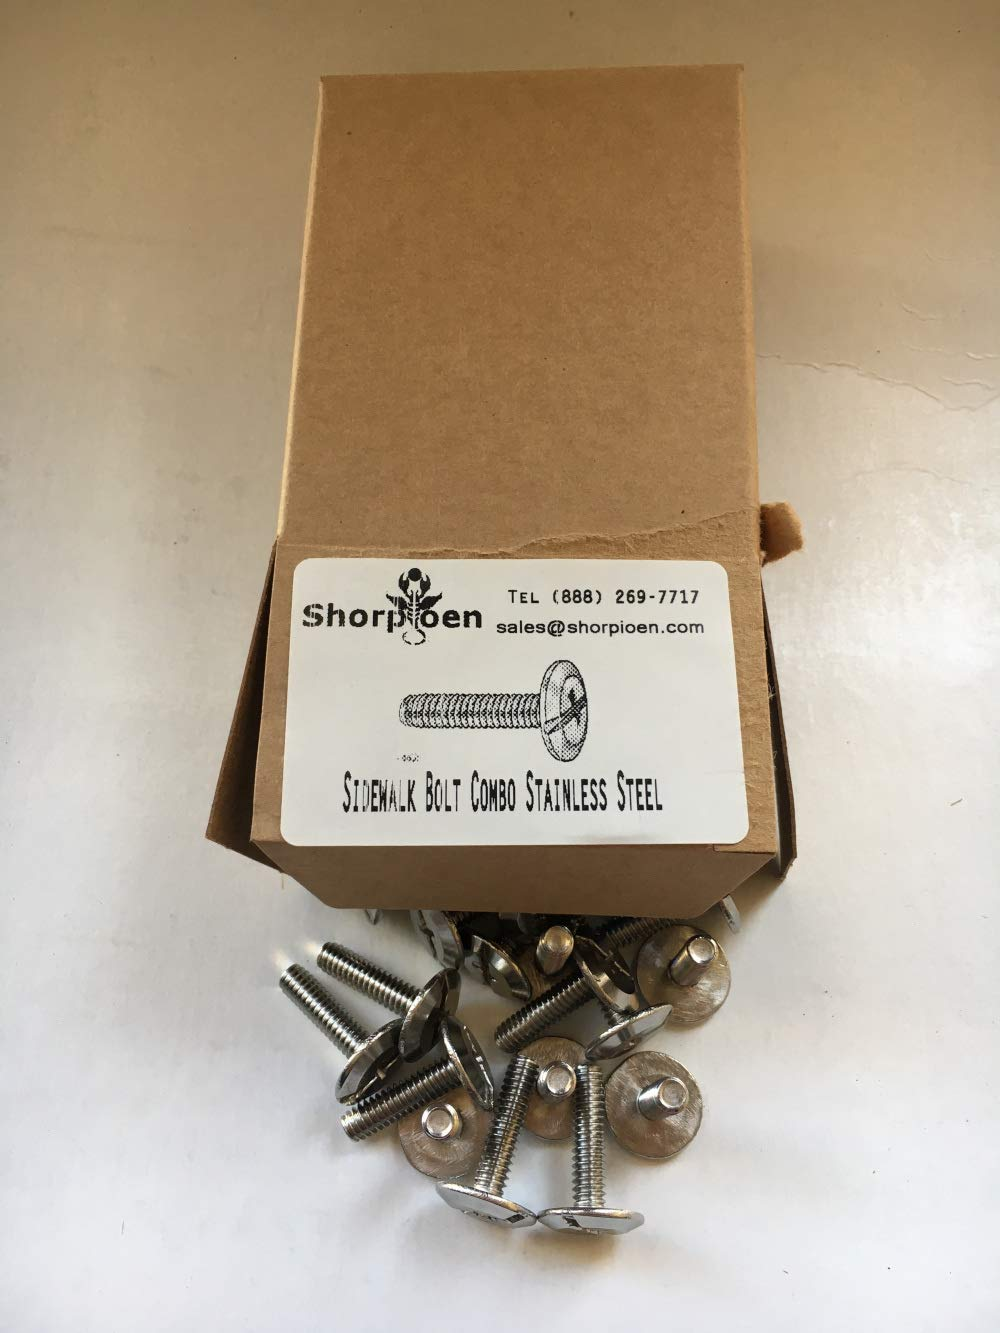 Pack of 25 Sidewalk Bolt Stainless Steel 1//4 x 1